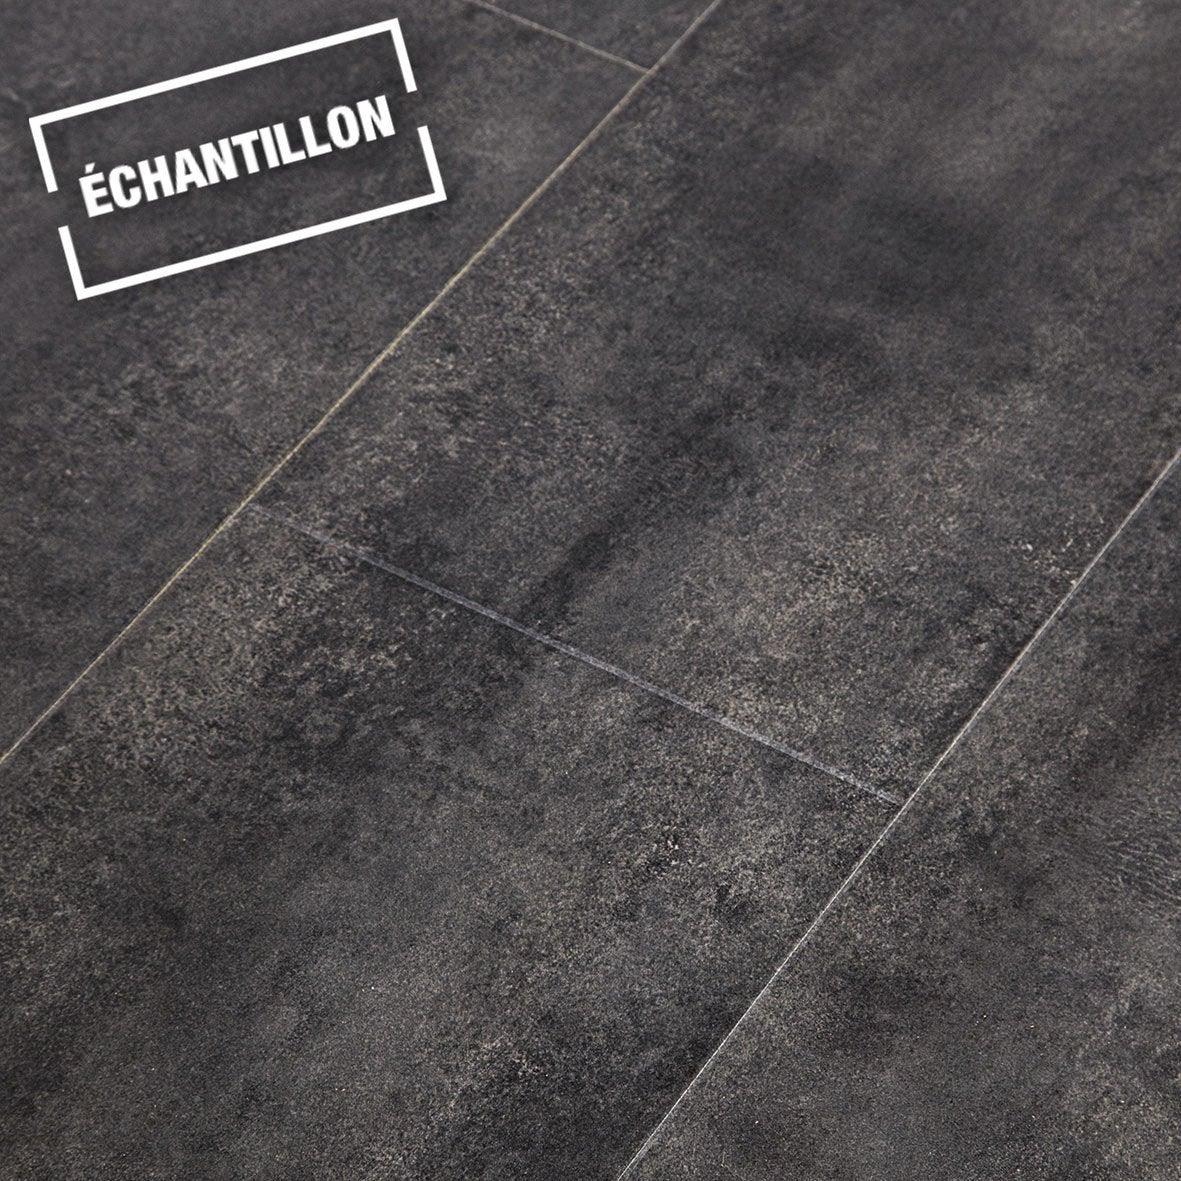 Echantillon Sol Stratifi Novofloor Effet B Ton Noir 2cx